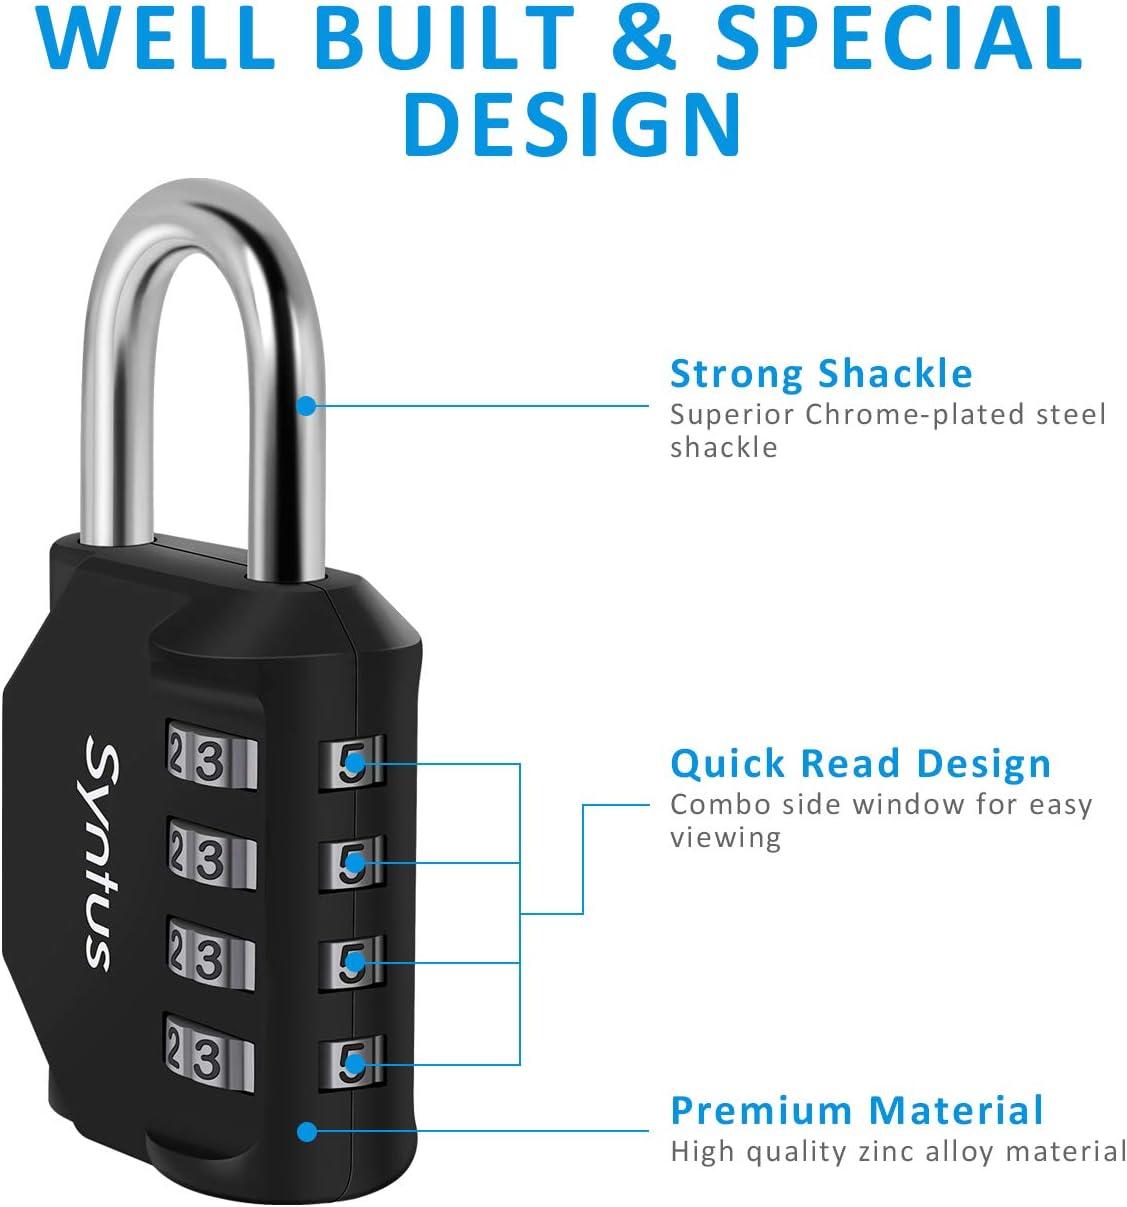 Black Sports Locker Toolbox Hasp Storage Case Syntus 2 Pack Combination Lock 4 Digit Padlock for School Gym Locker Fence